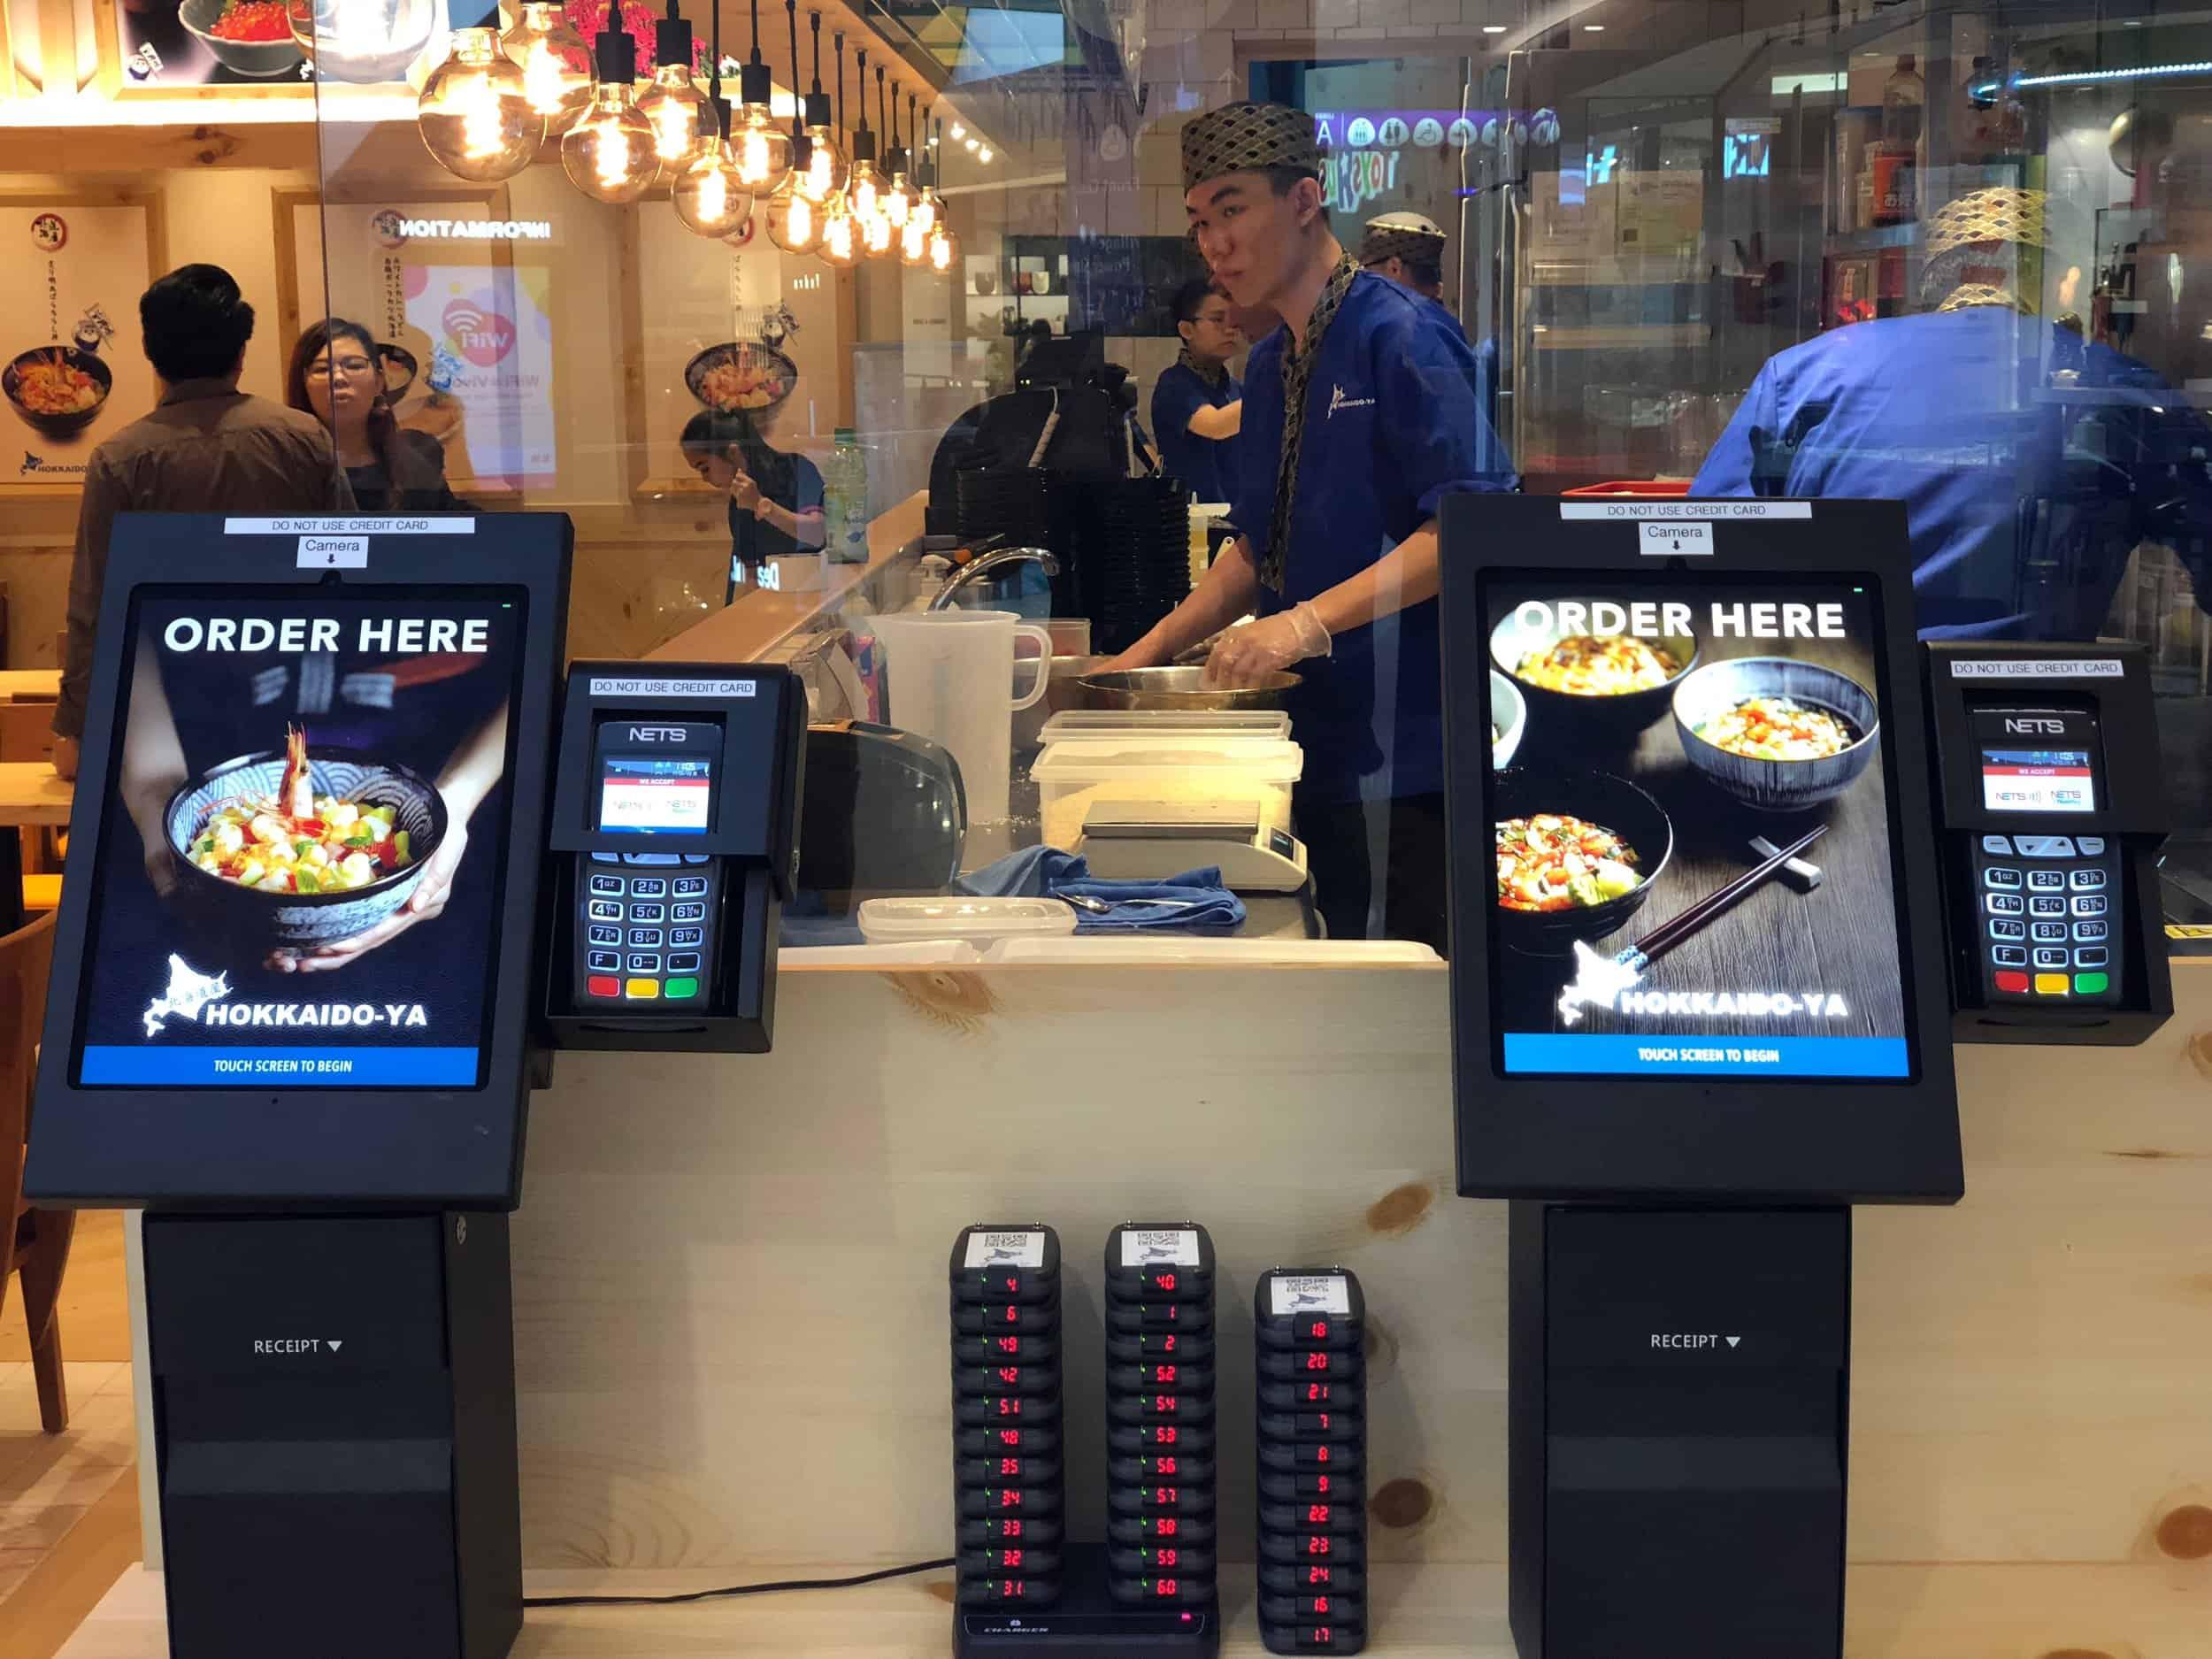 Hokkaido-Ya Adopts Self Service Kiosk By TabSquare-1